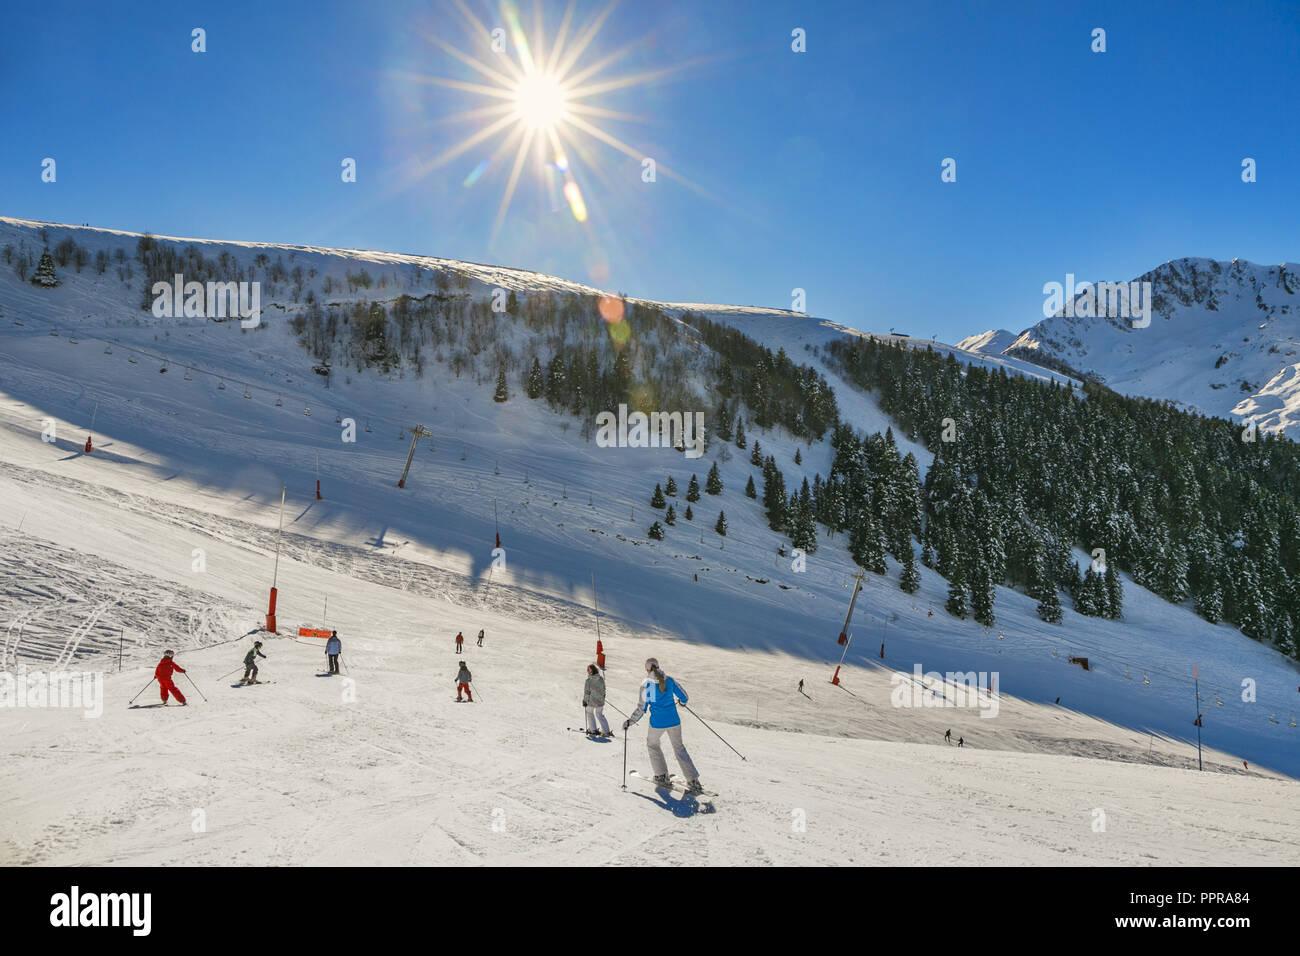 Luchon- Superbagneres ski resort. Bagneres de Luchon. Haute-Garonne. Midi Pyrenees. France. - Stock Image